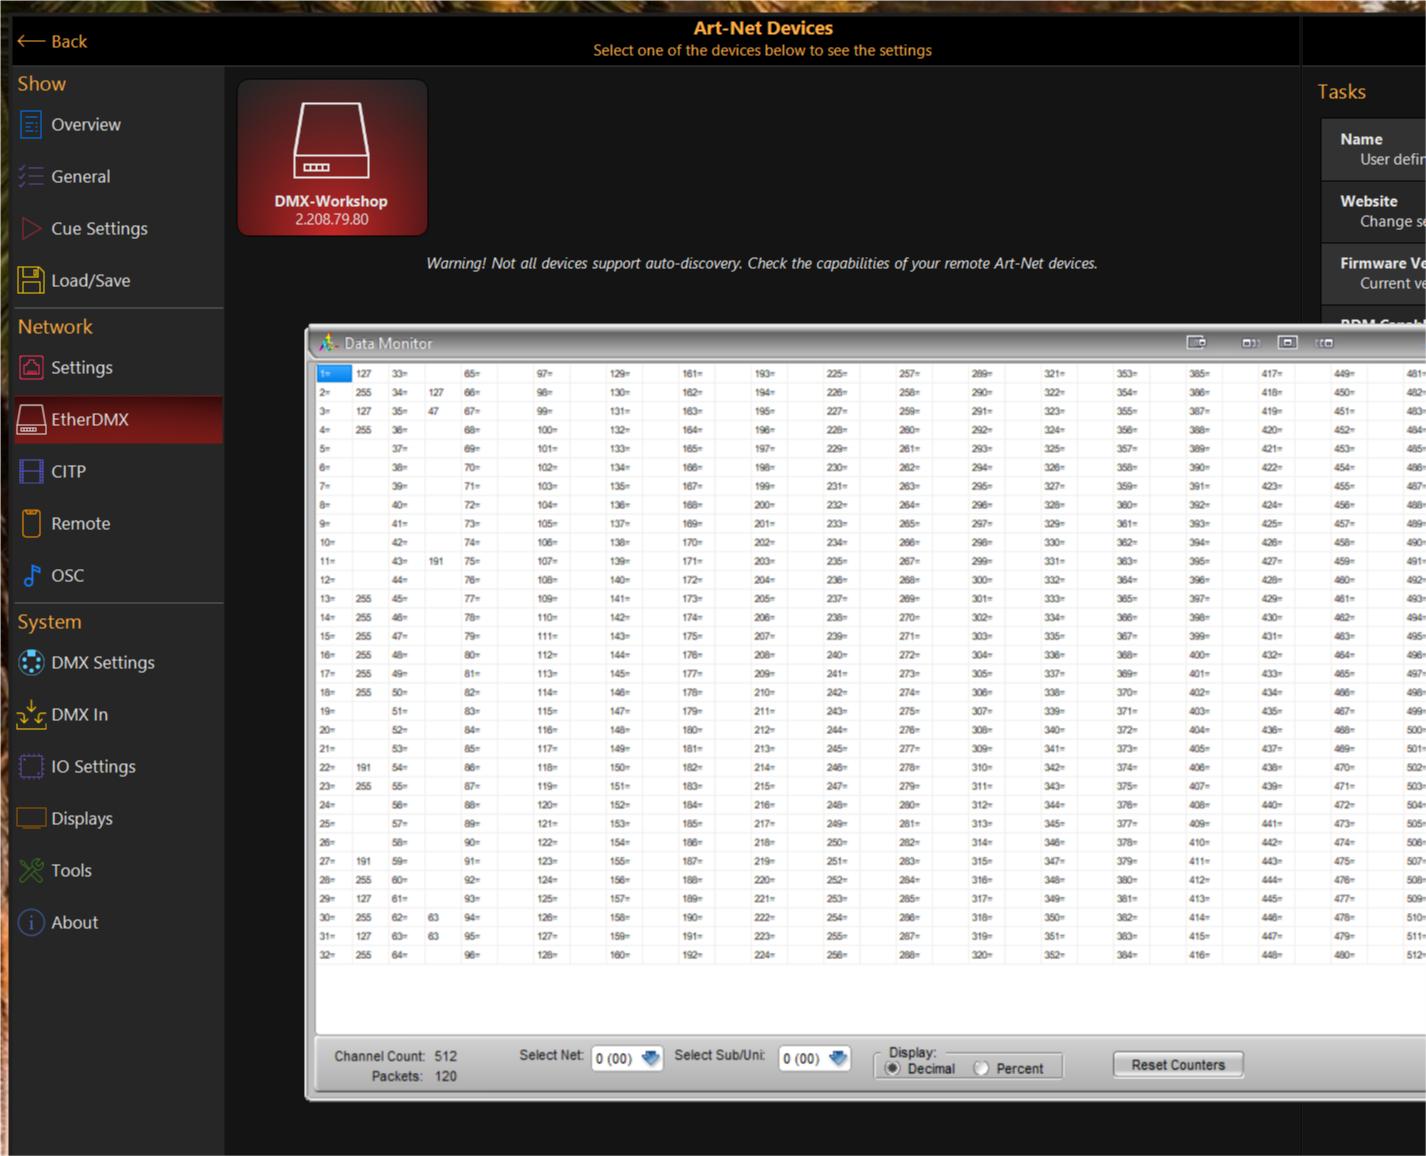 No sACN or artnet anymore, windows 10 home - Software